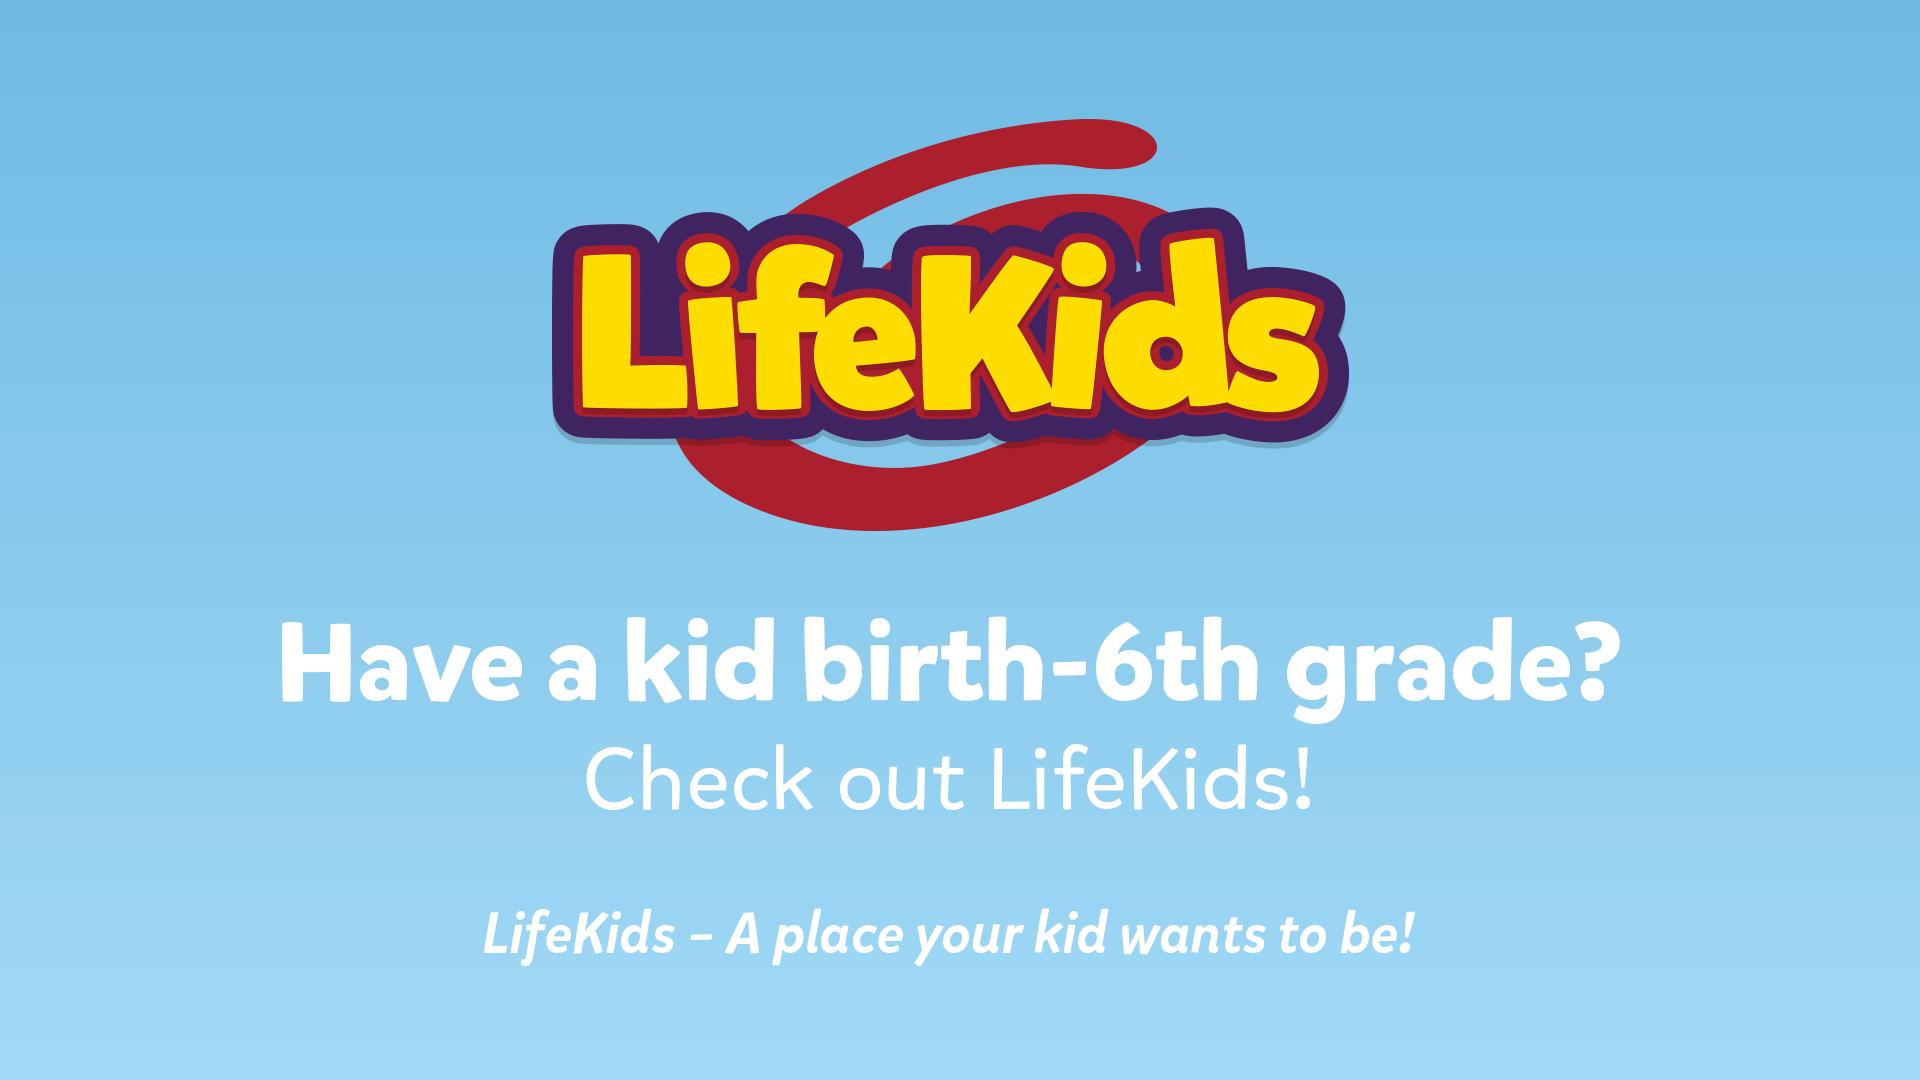 Have a kid birth - 6th grade? Check out LifeKids! (JPG)